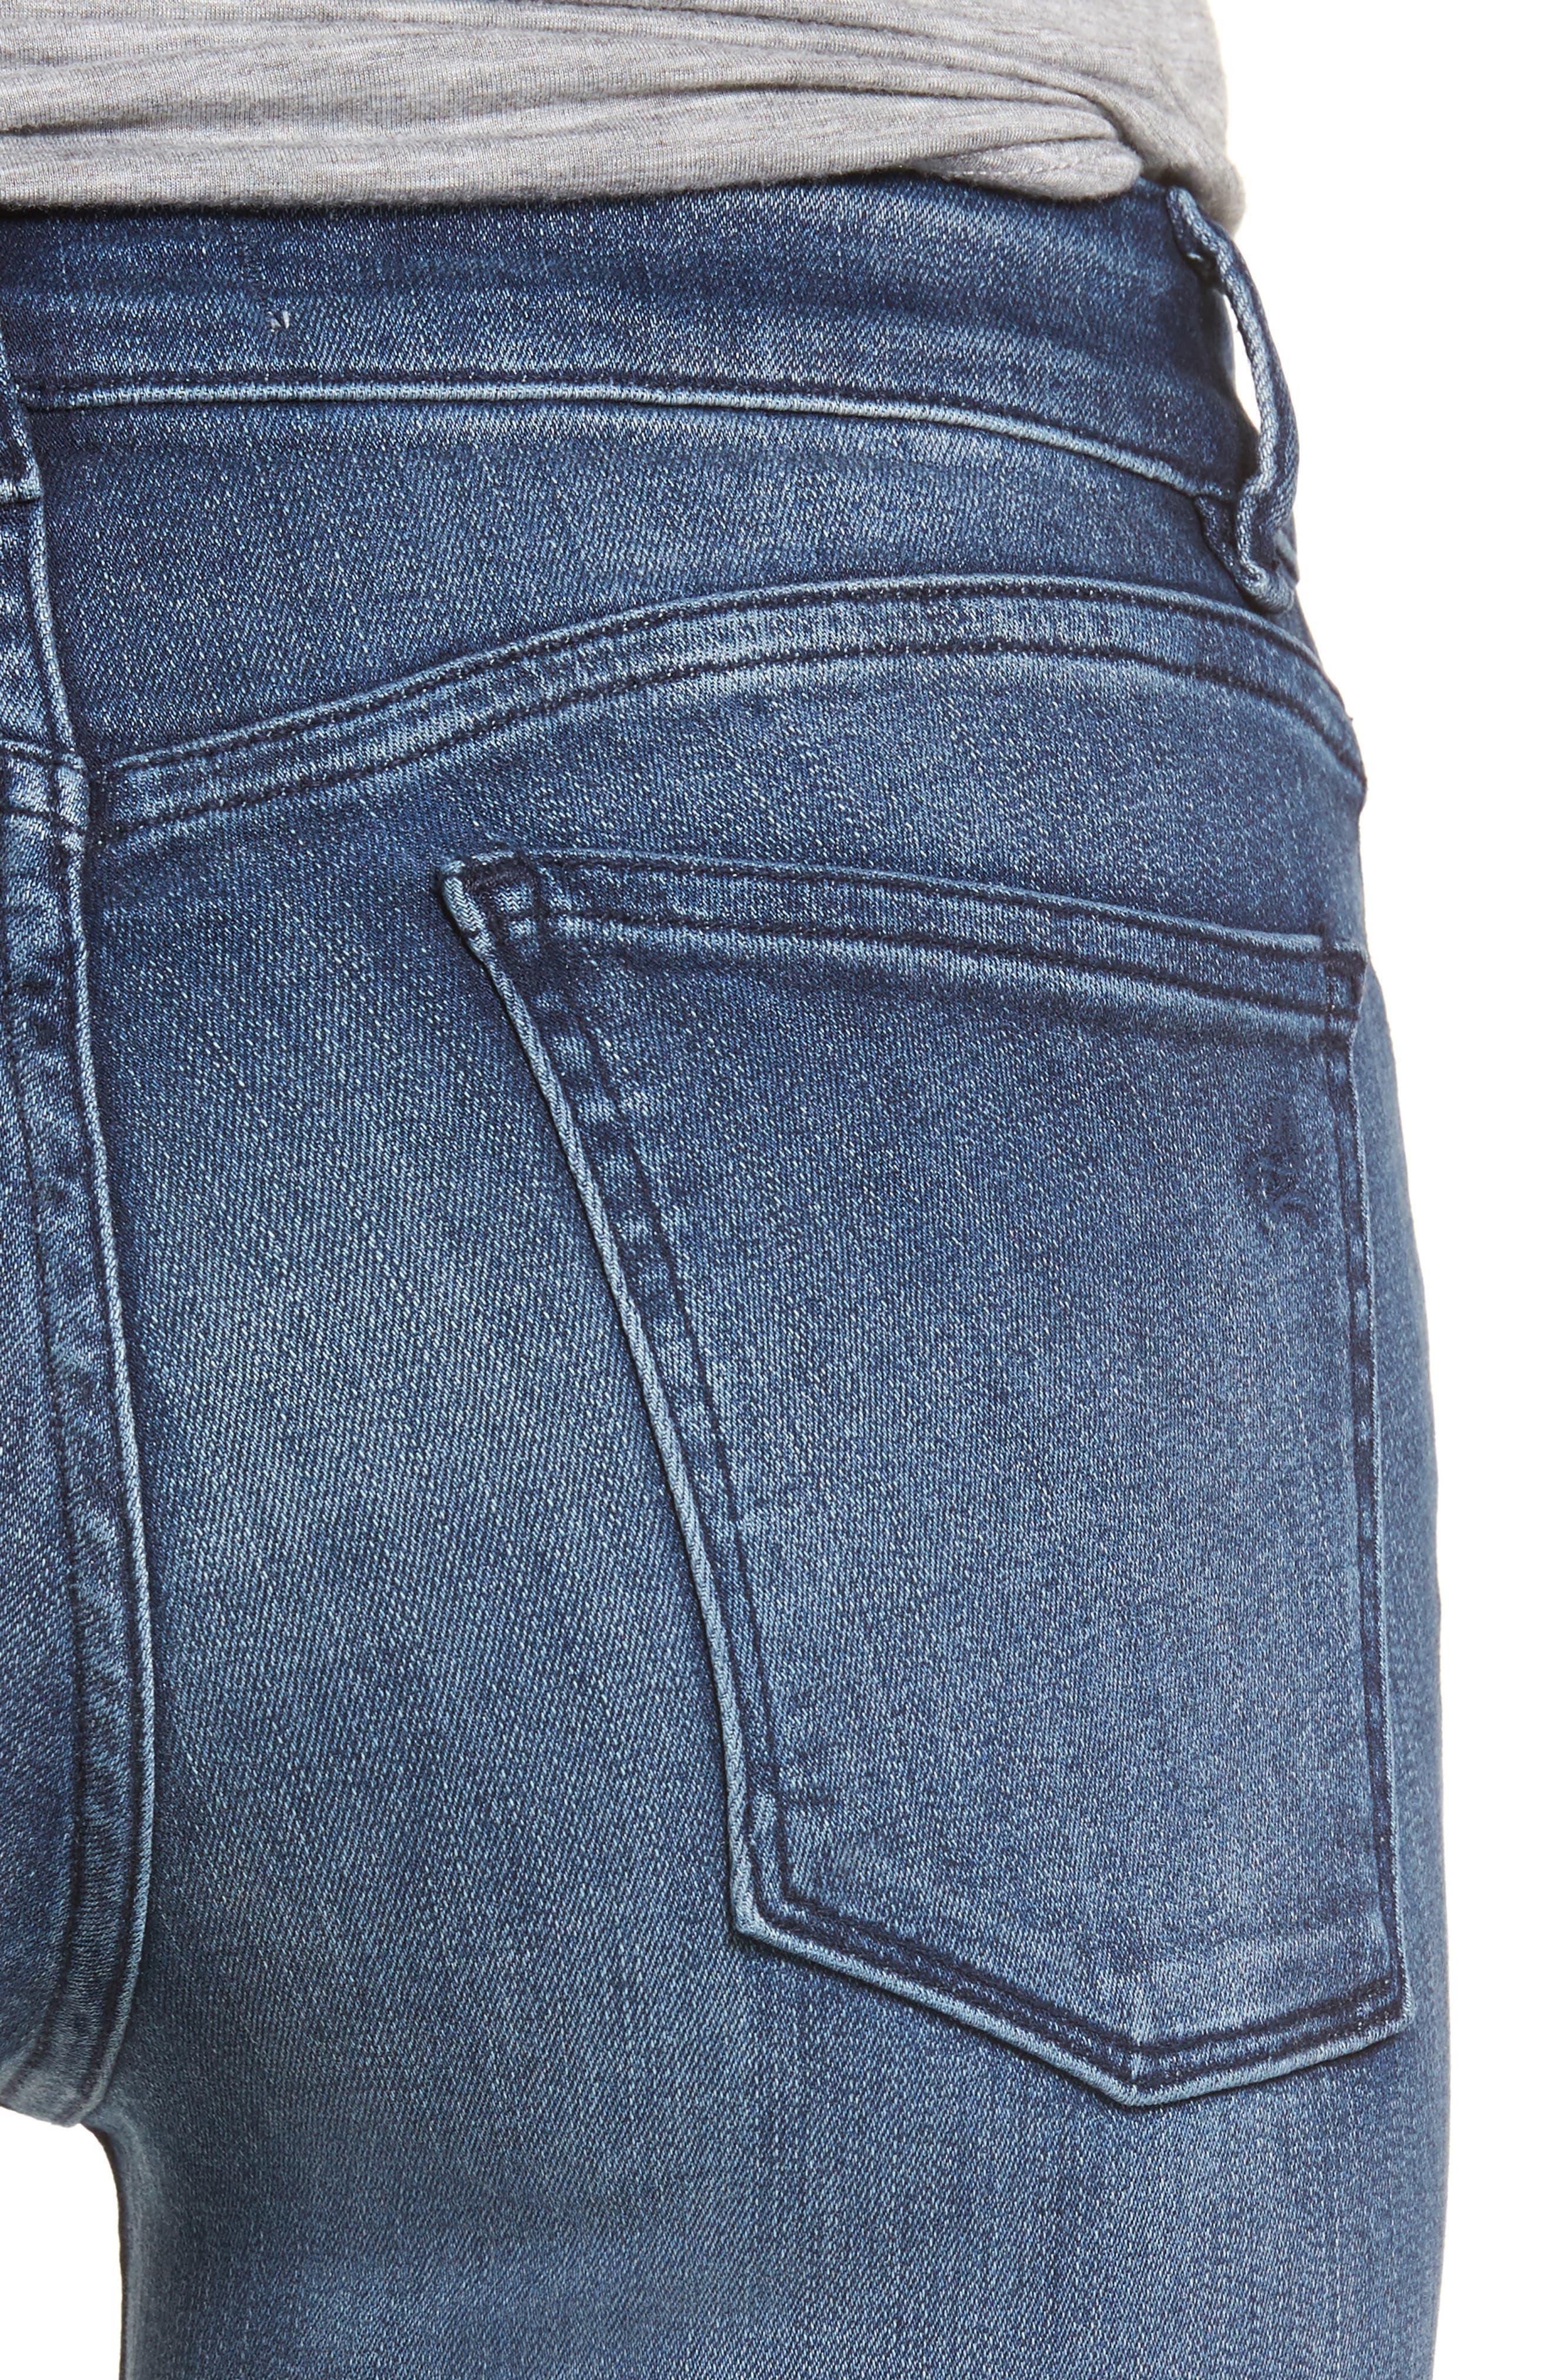 Emma Power Legging Jeans,                             Alternate thumbnail 4, color,                             425